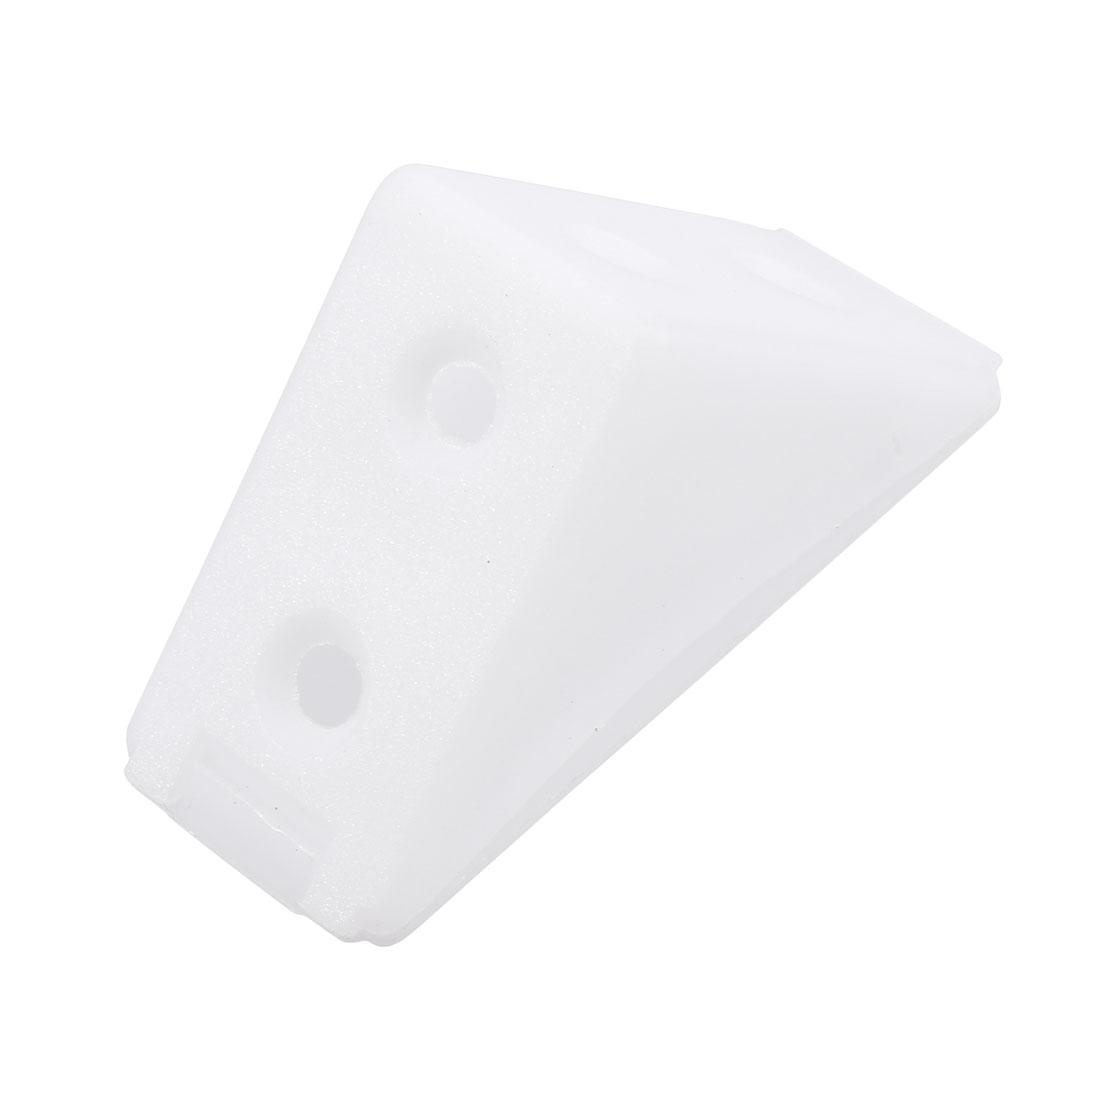 Shelf Cabinet Plastic Corner Braces 4 Holes Angle Brackets w Cover Cap, 20 Pcs